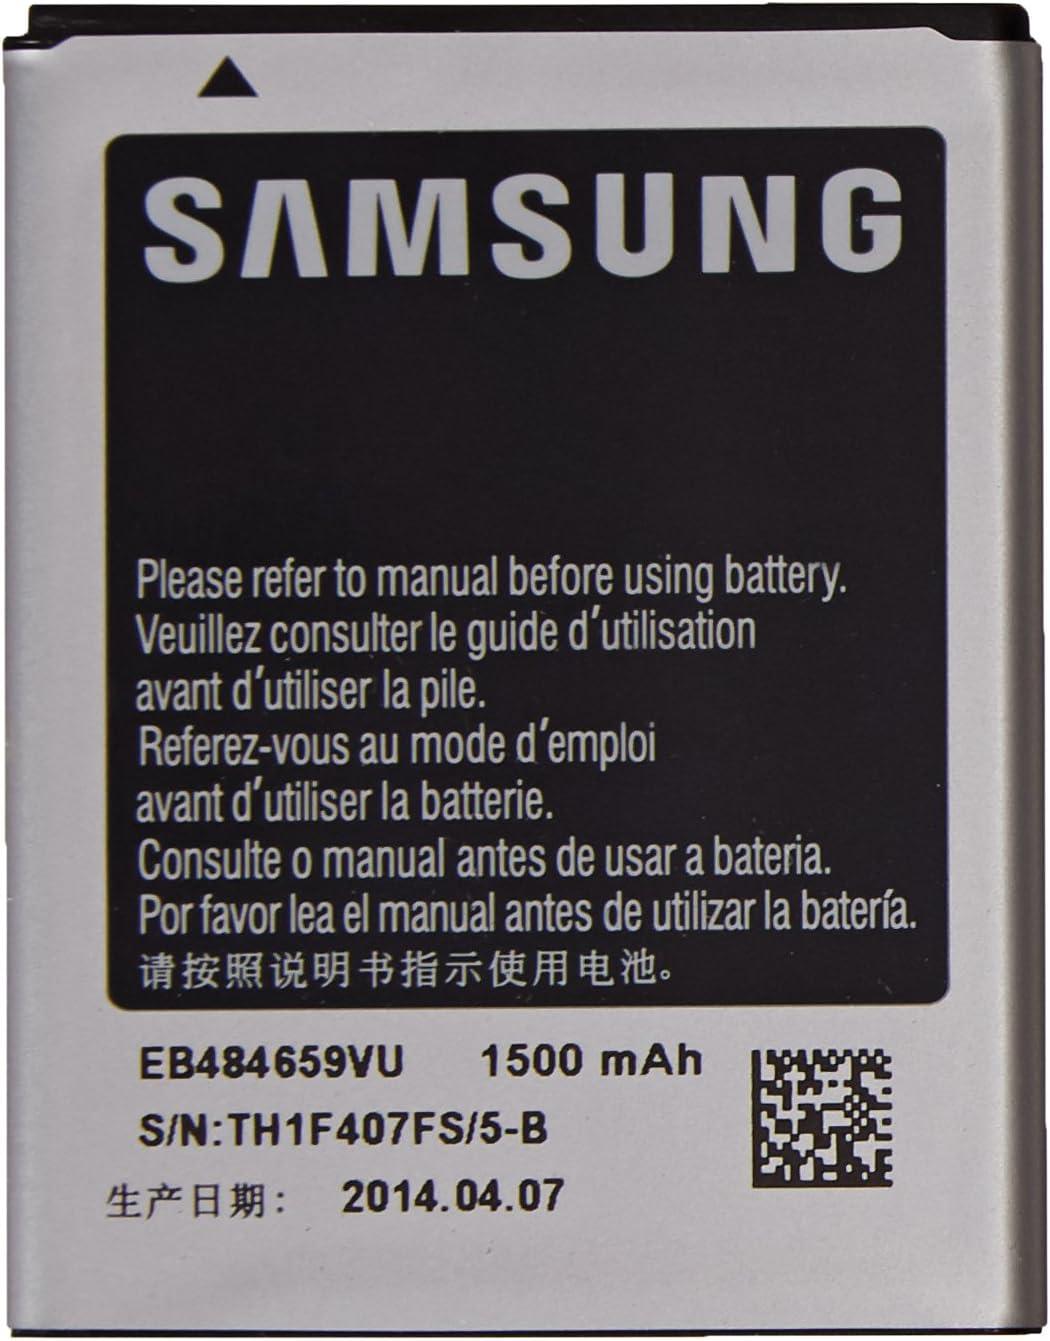 Samsung 23140091 Original /& Neu EB484659VU 1500 mAh f/ür Samsung i8150 Galaxy W // S8600 Wave 3 // S5690 xCover // i8350 Omnia W Frustation free Packaging Li-Ion